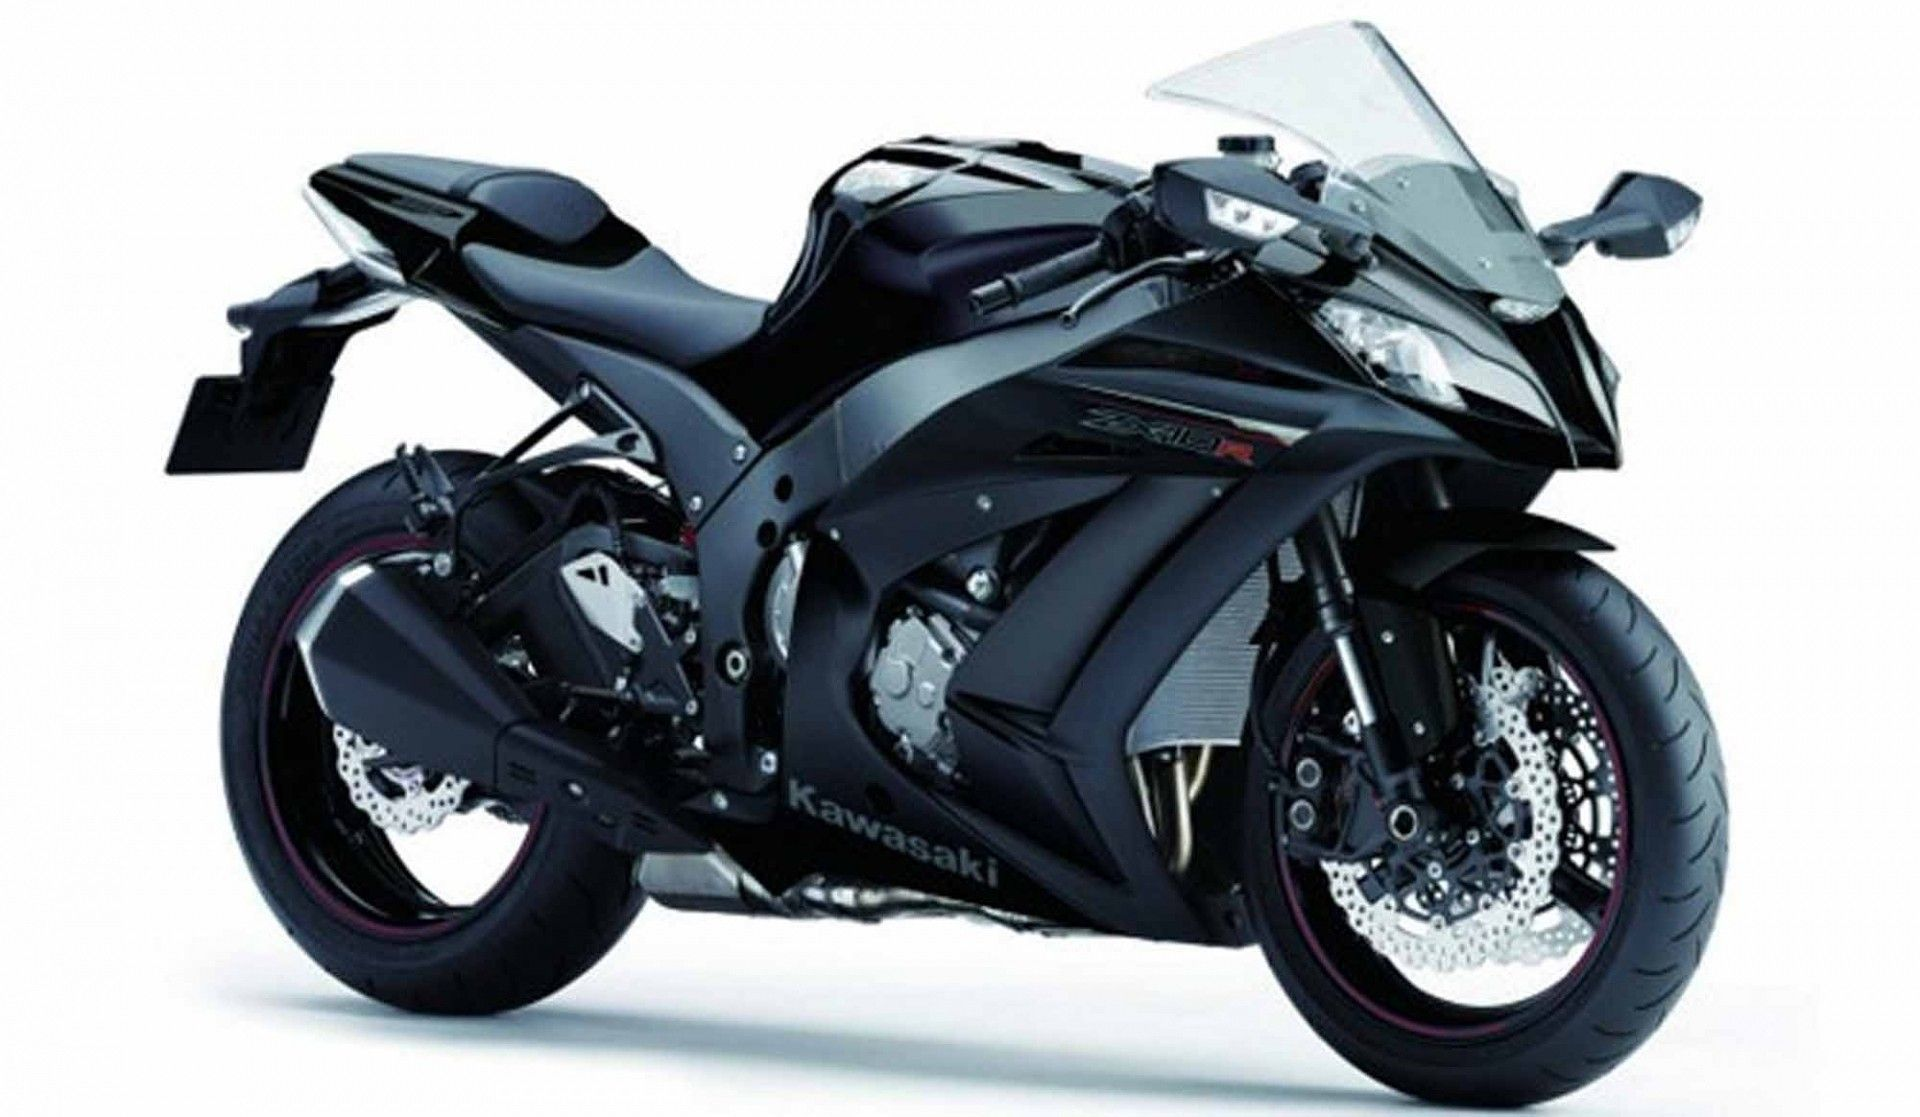 Kawasaki Ninja 250r 2014 Black Ideas Kawasaki Ninja 250r